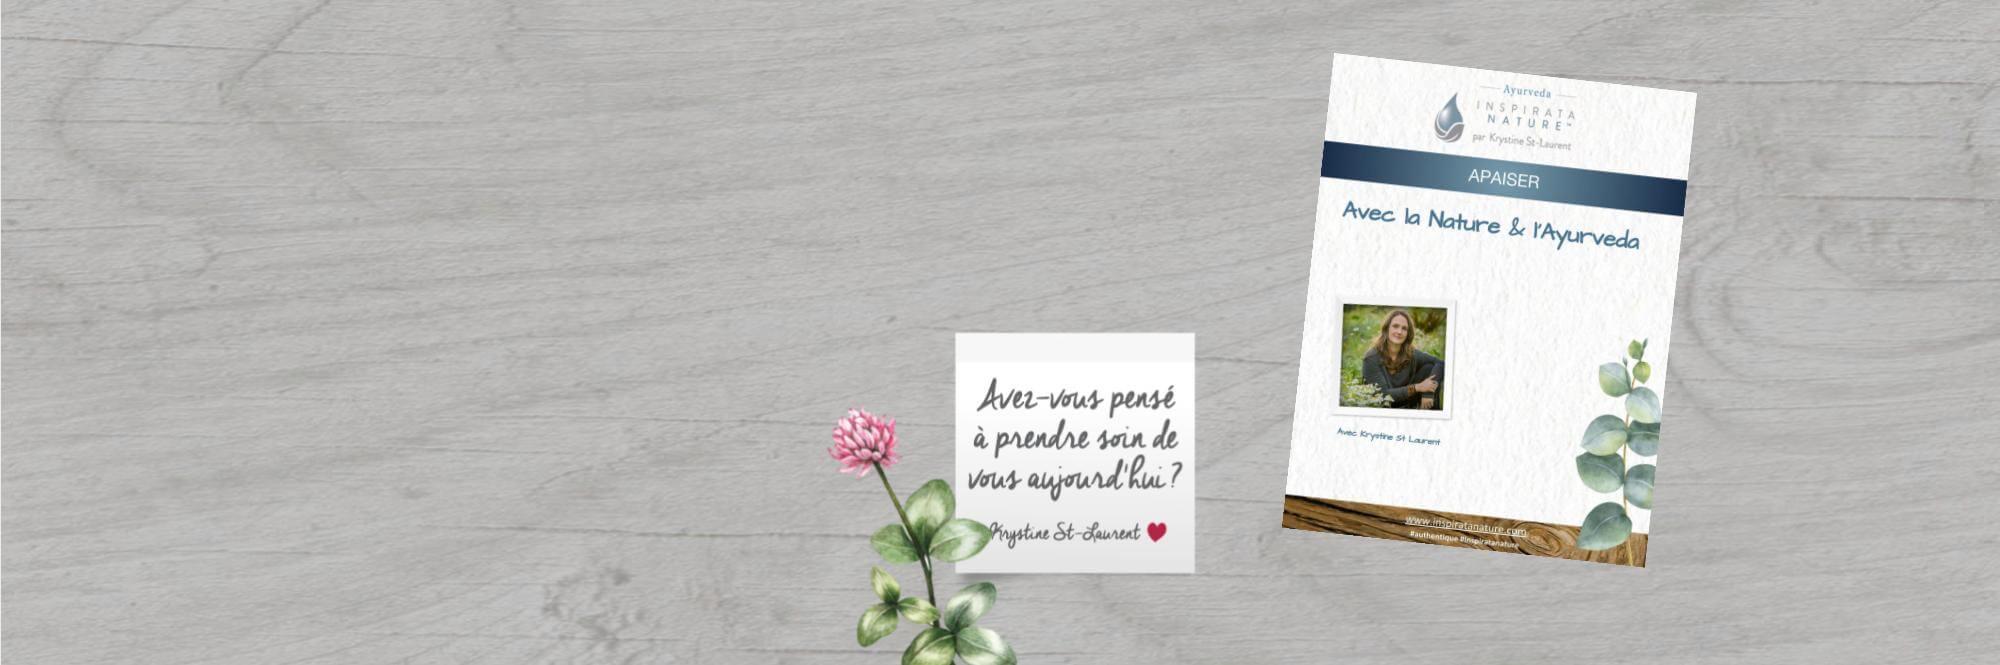 Infolettre Krystine St-Laurent